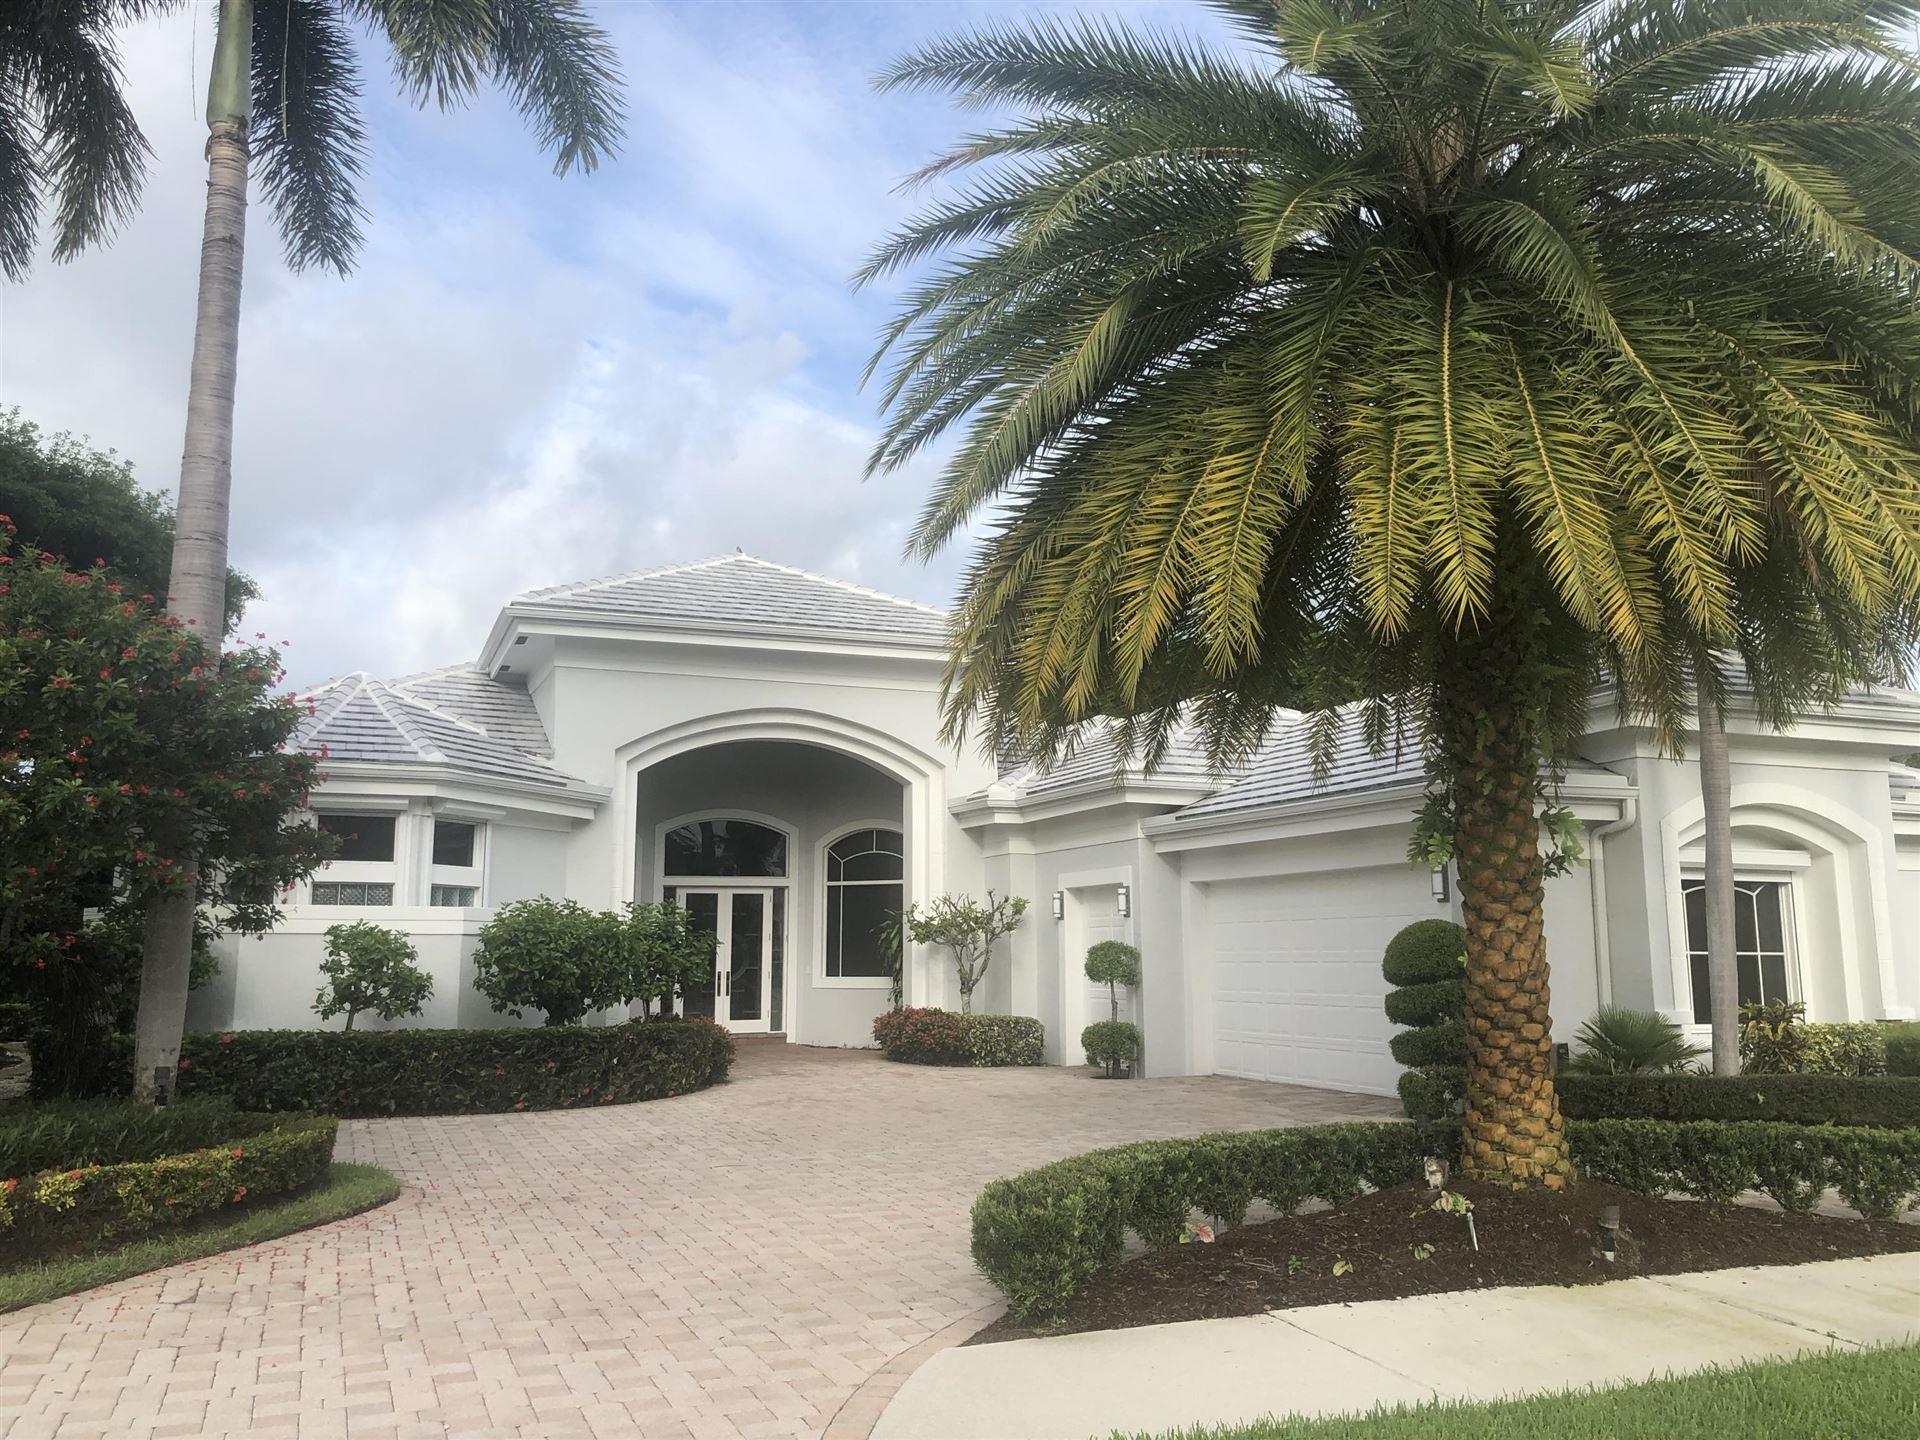 Photo of 125 Saint Martin Drive, Palm Beach Gardens, FL 33418 (MLS # RX-10738608)